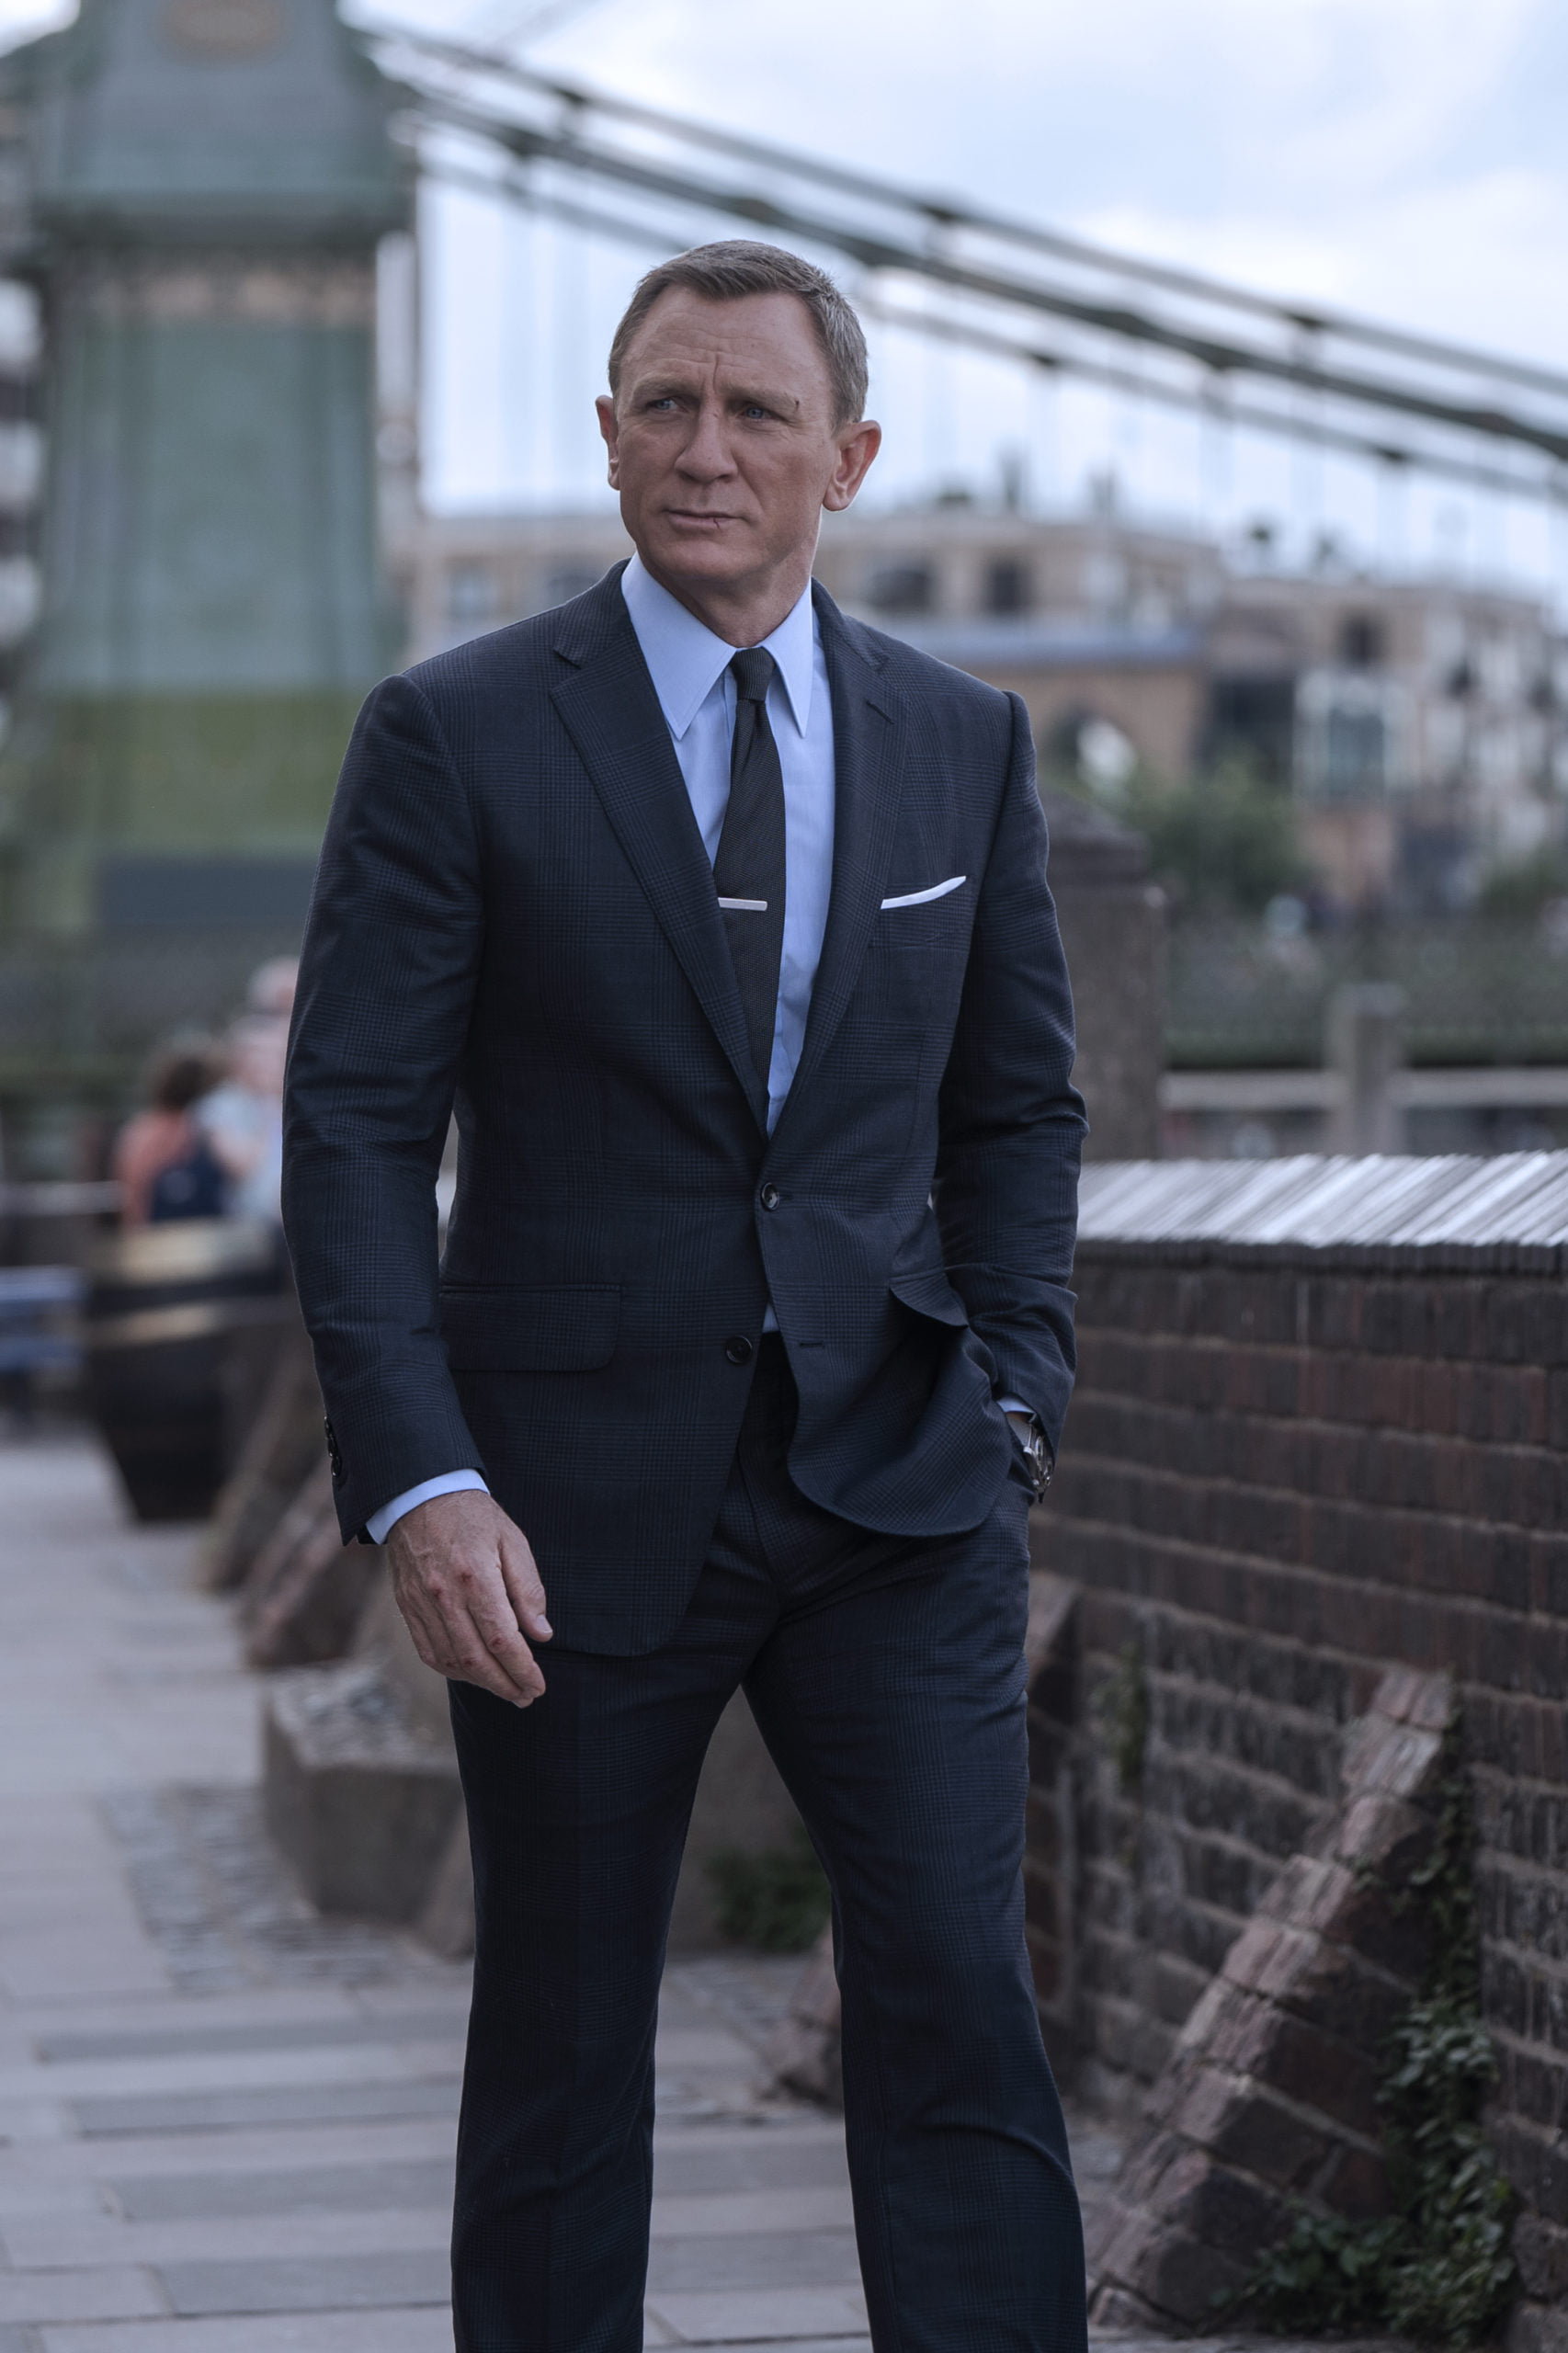 James Bond 007 Tom Ford